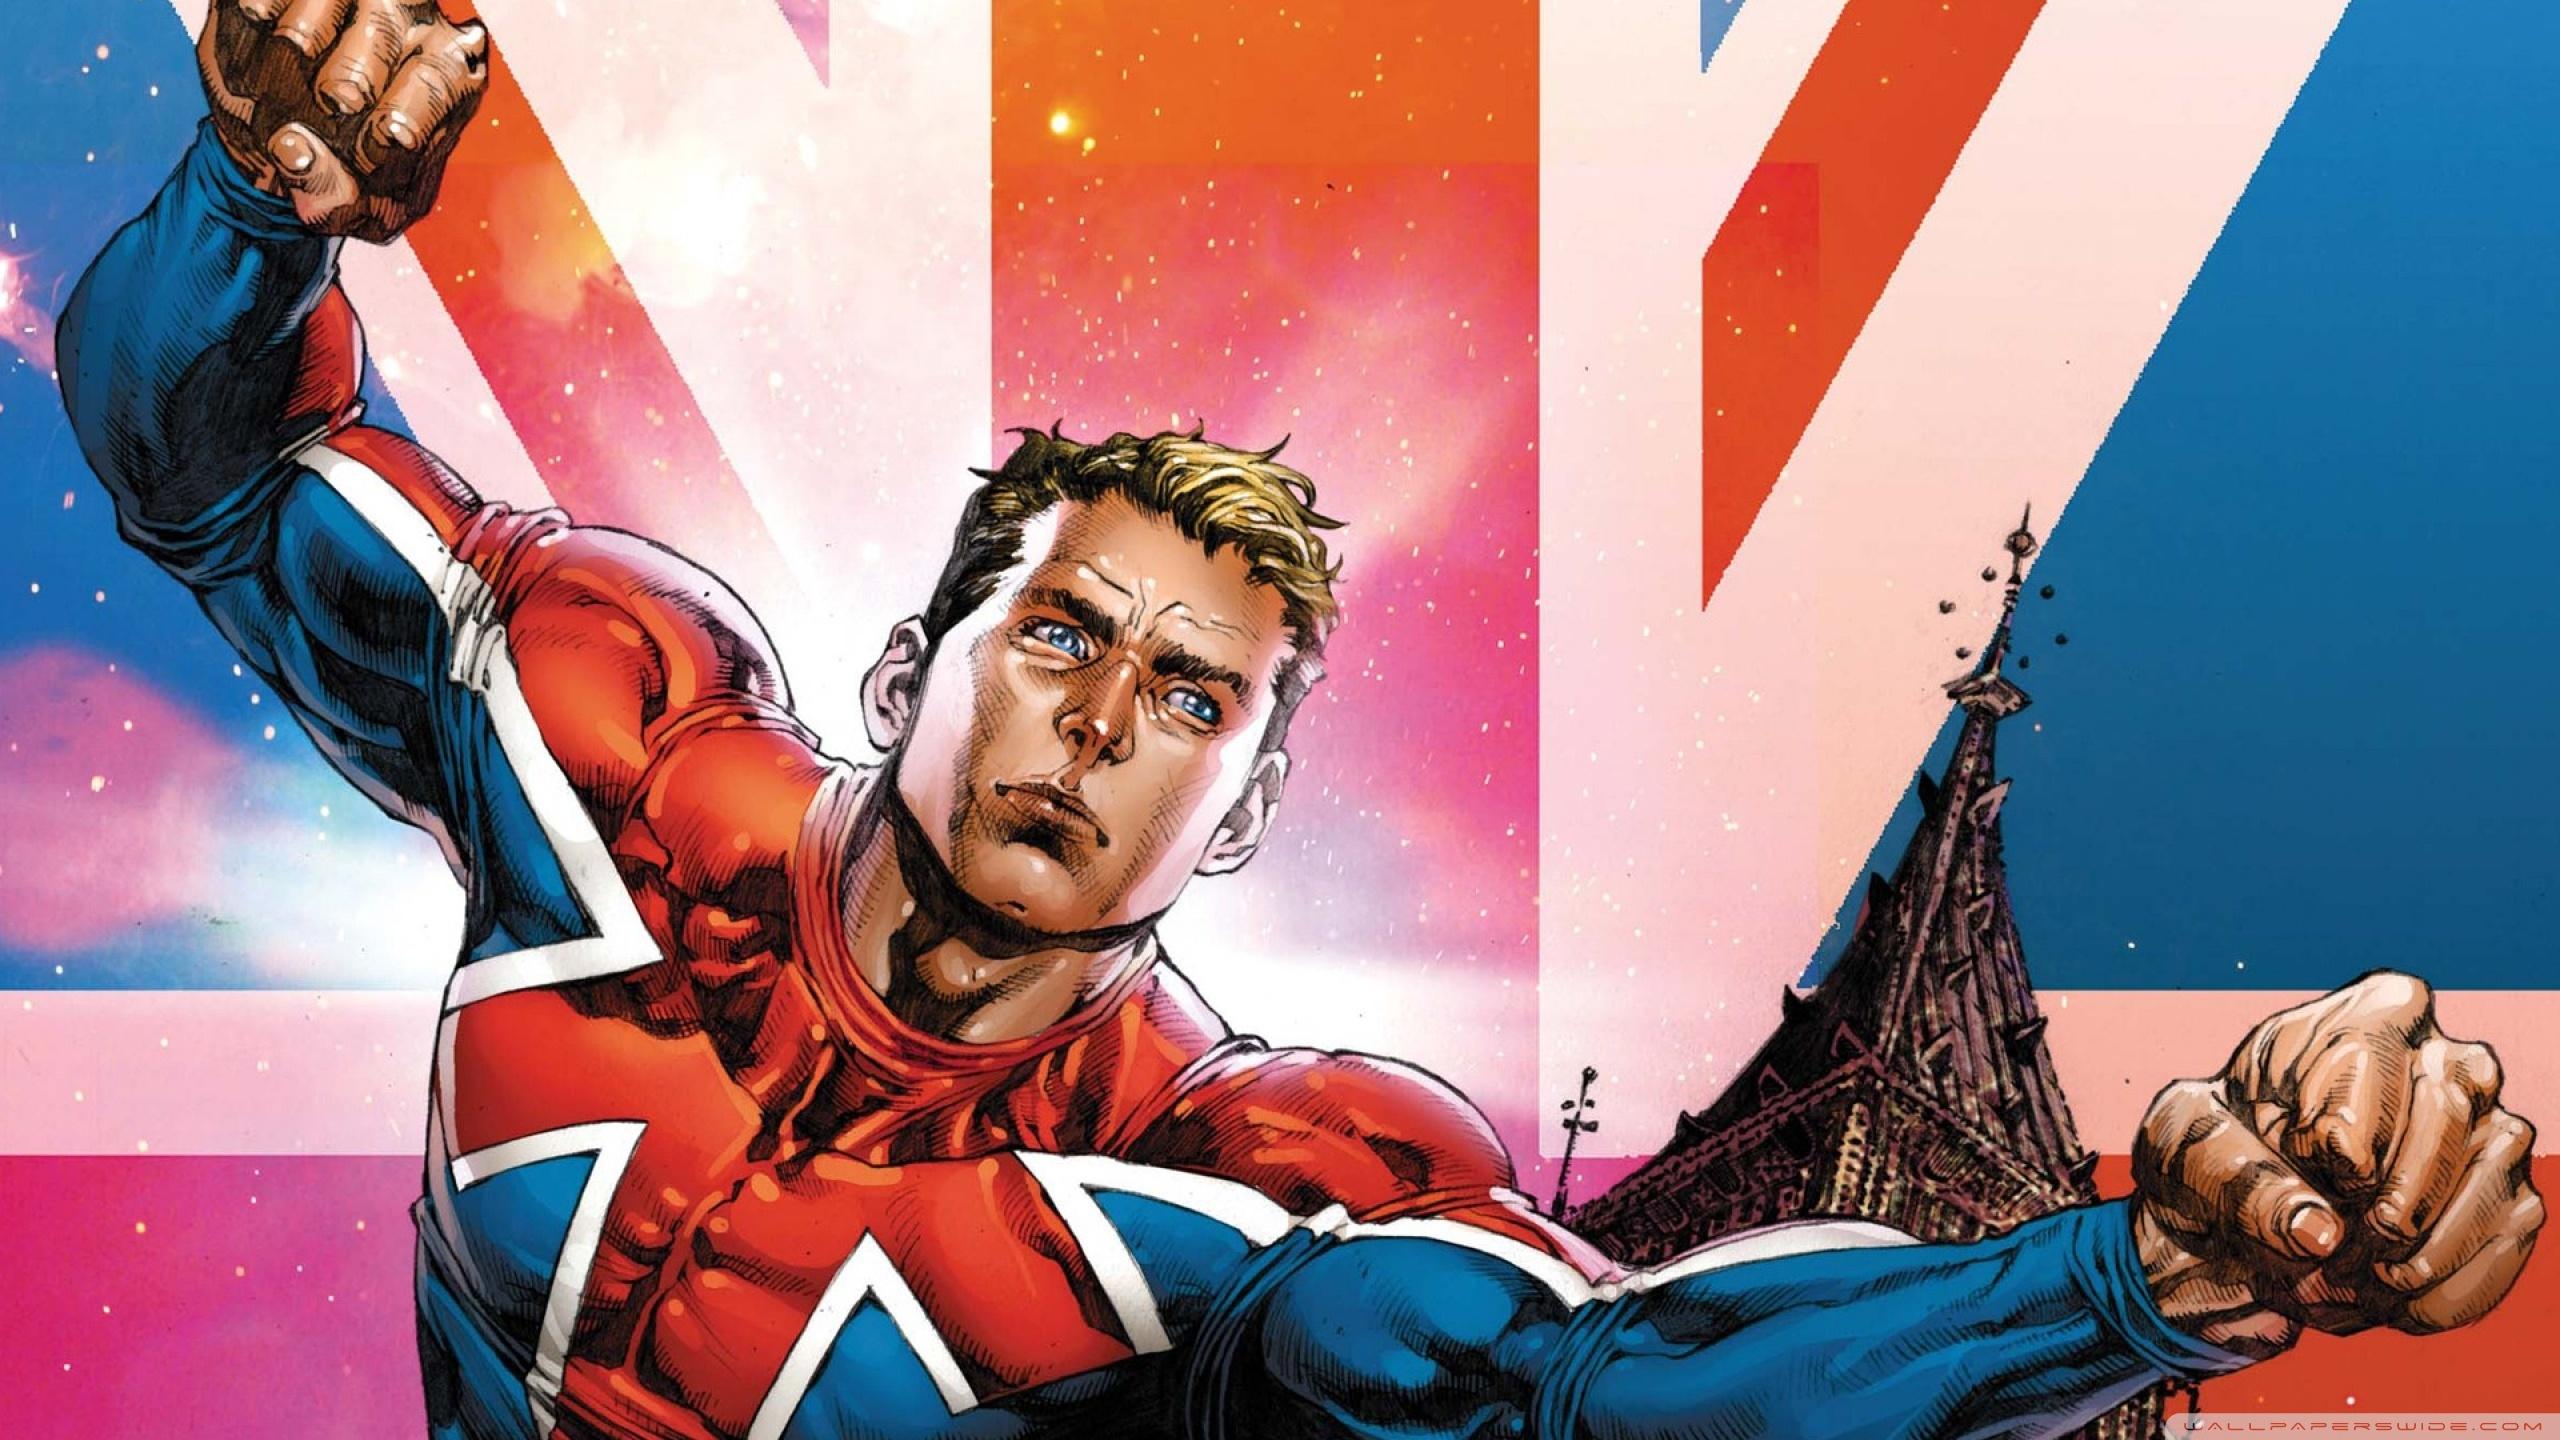 Captain Britain 4K HD Desktop Wallpaper for 4K Ultra HD TV 2560x1440